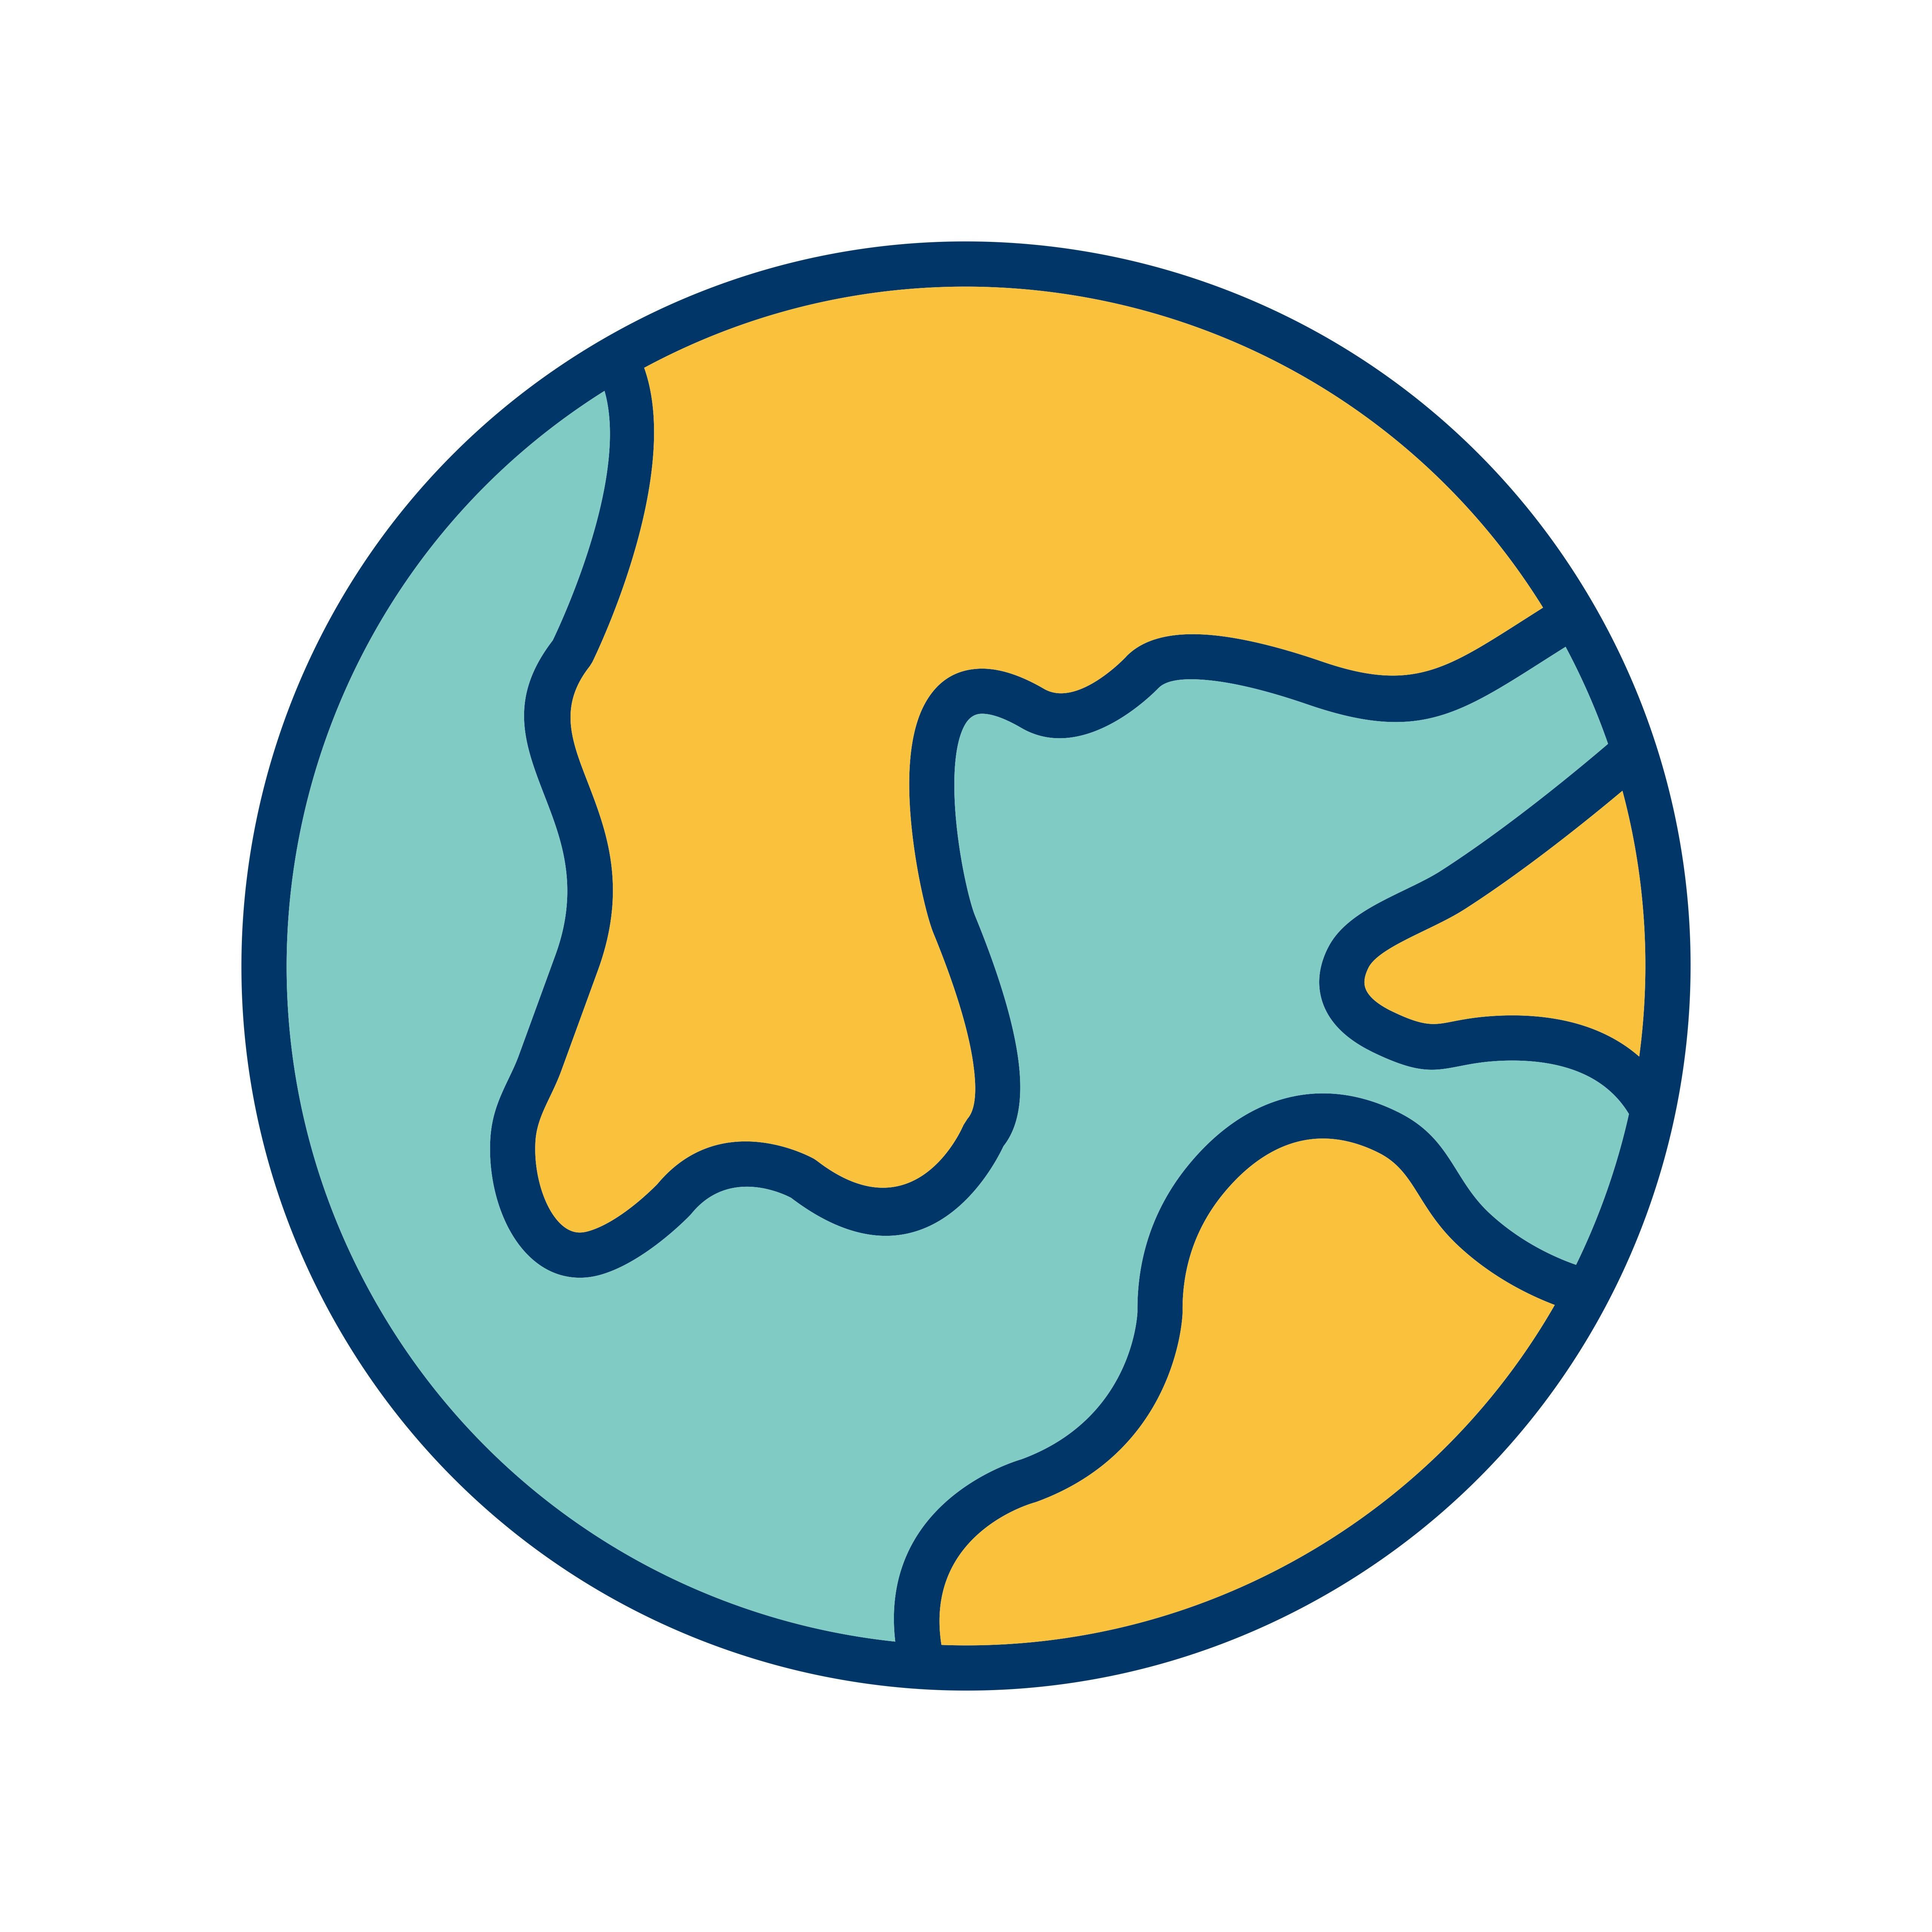 Earth Vector Icon 439851 - Download Free Vectors, Clipart ...